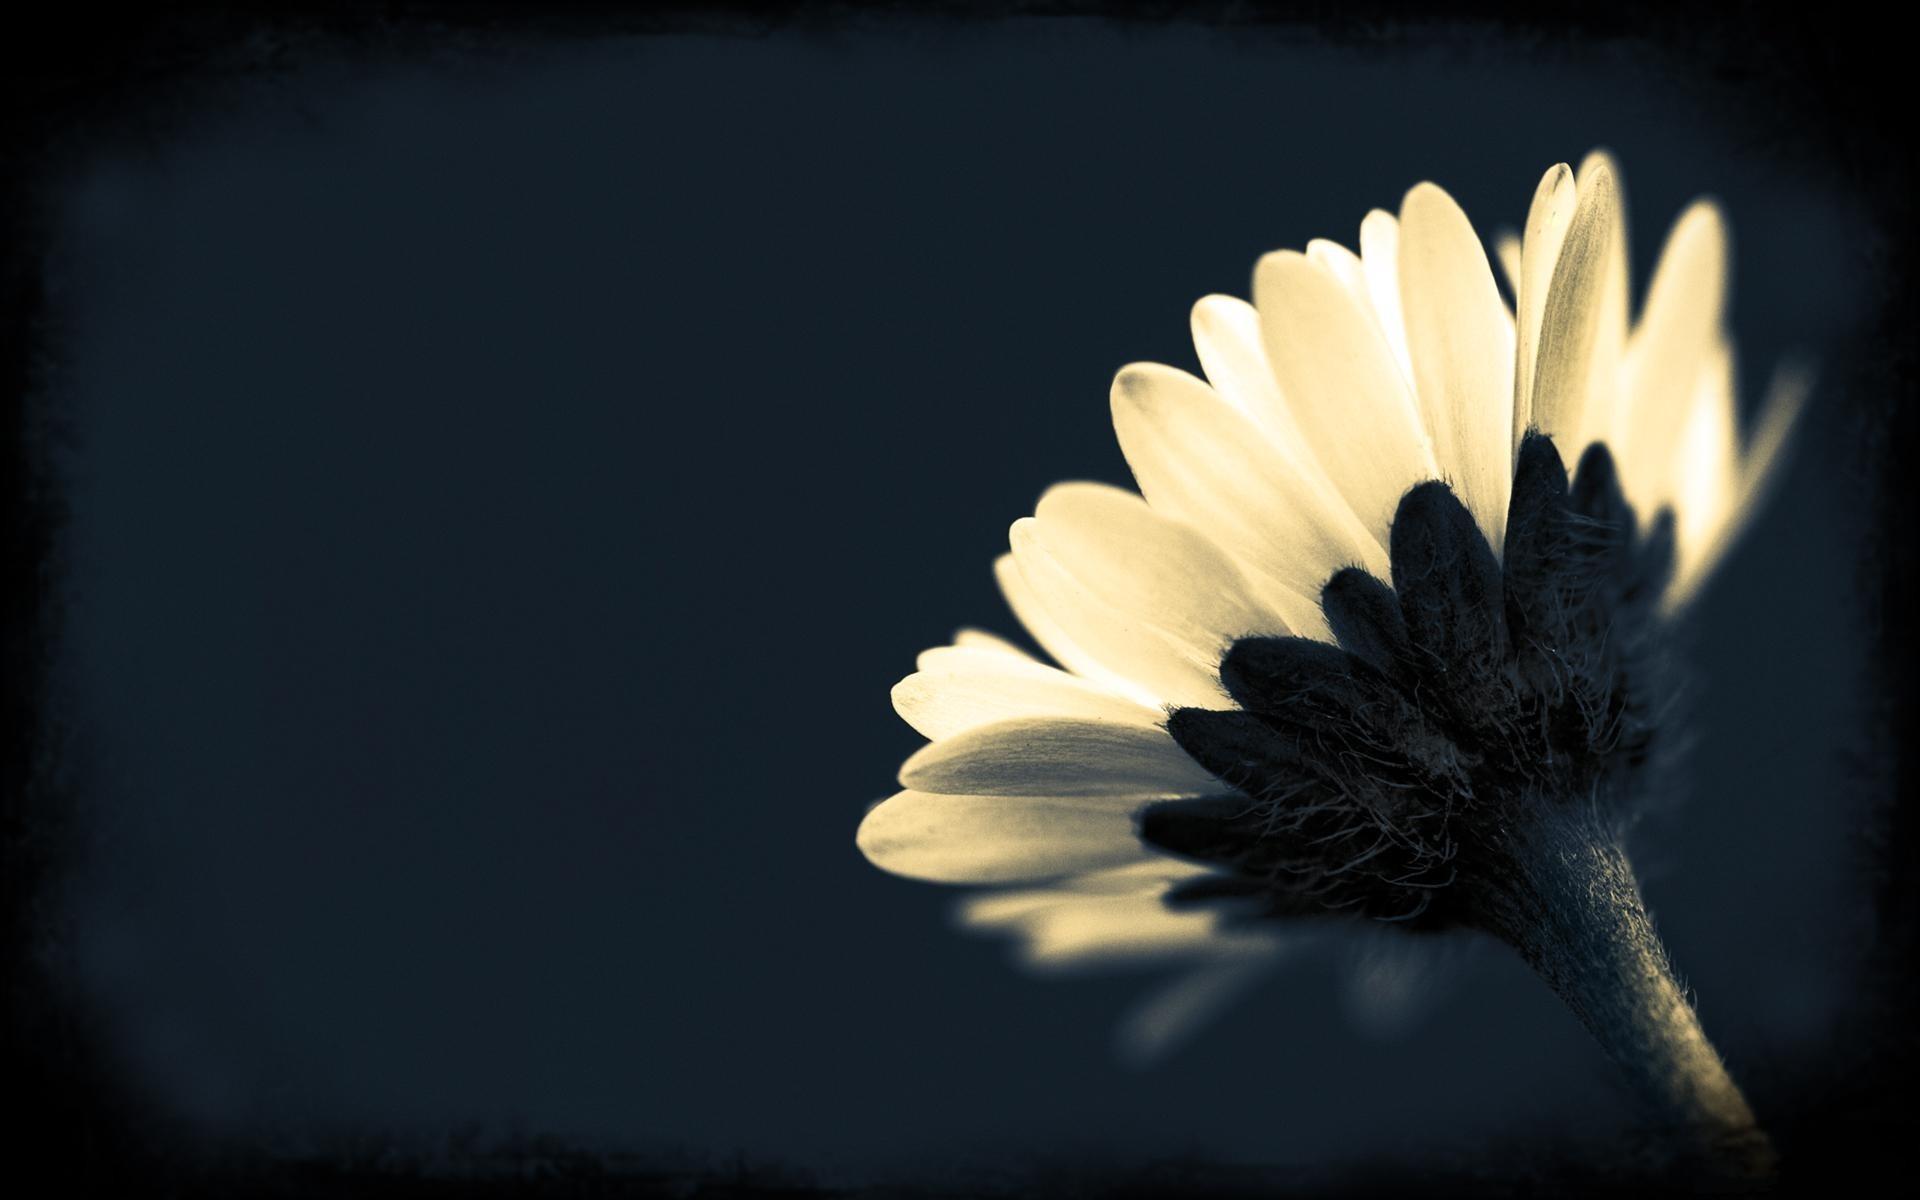 black flowers and plants 8 free hd wallpaper hdflowerwallpaper com